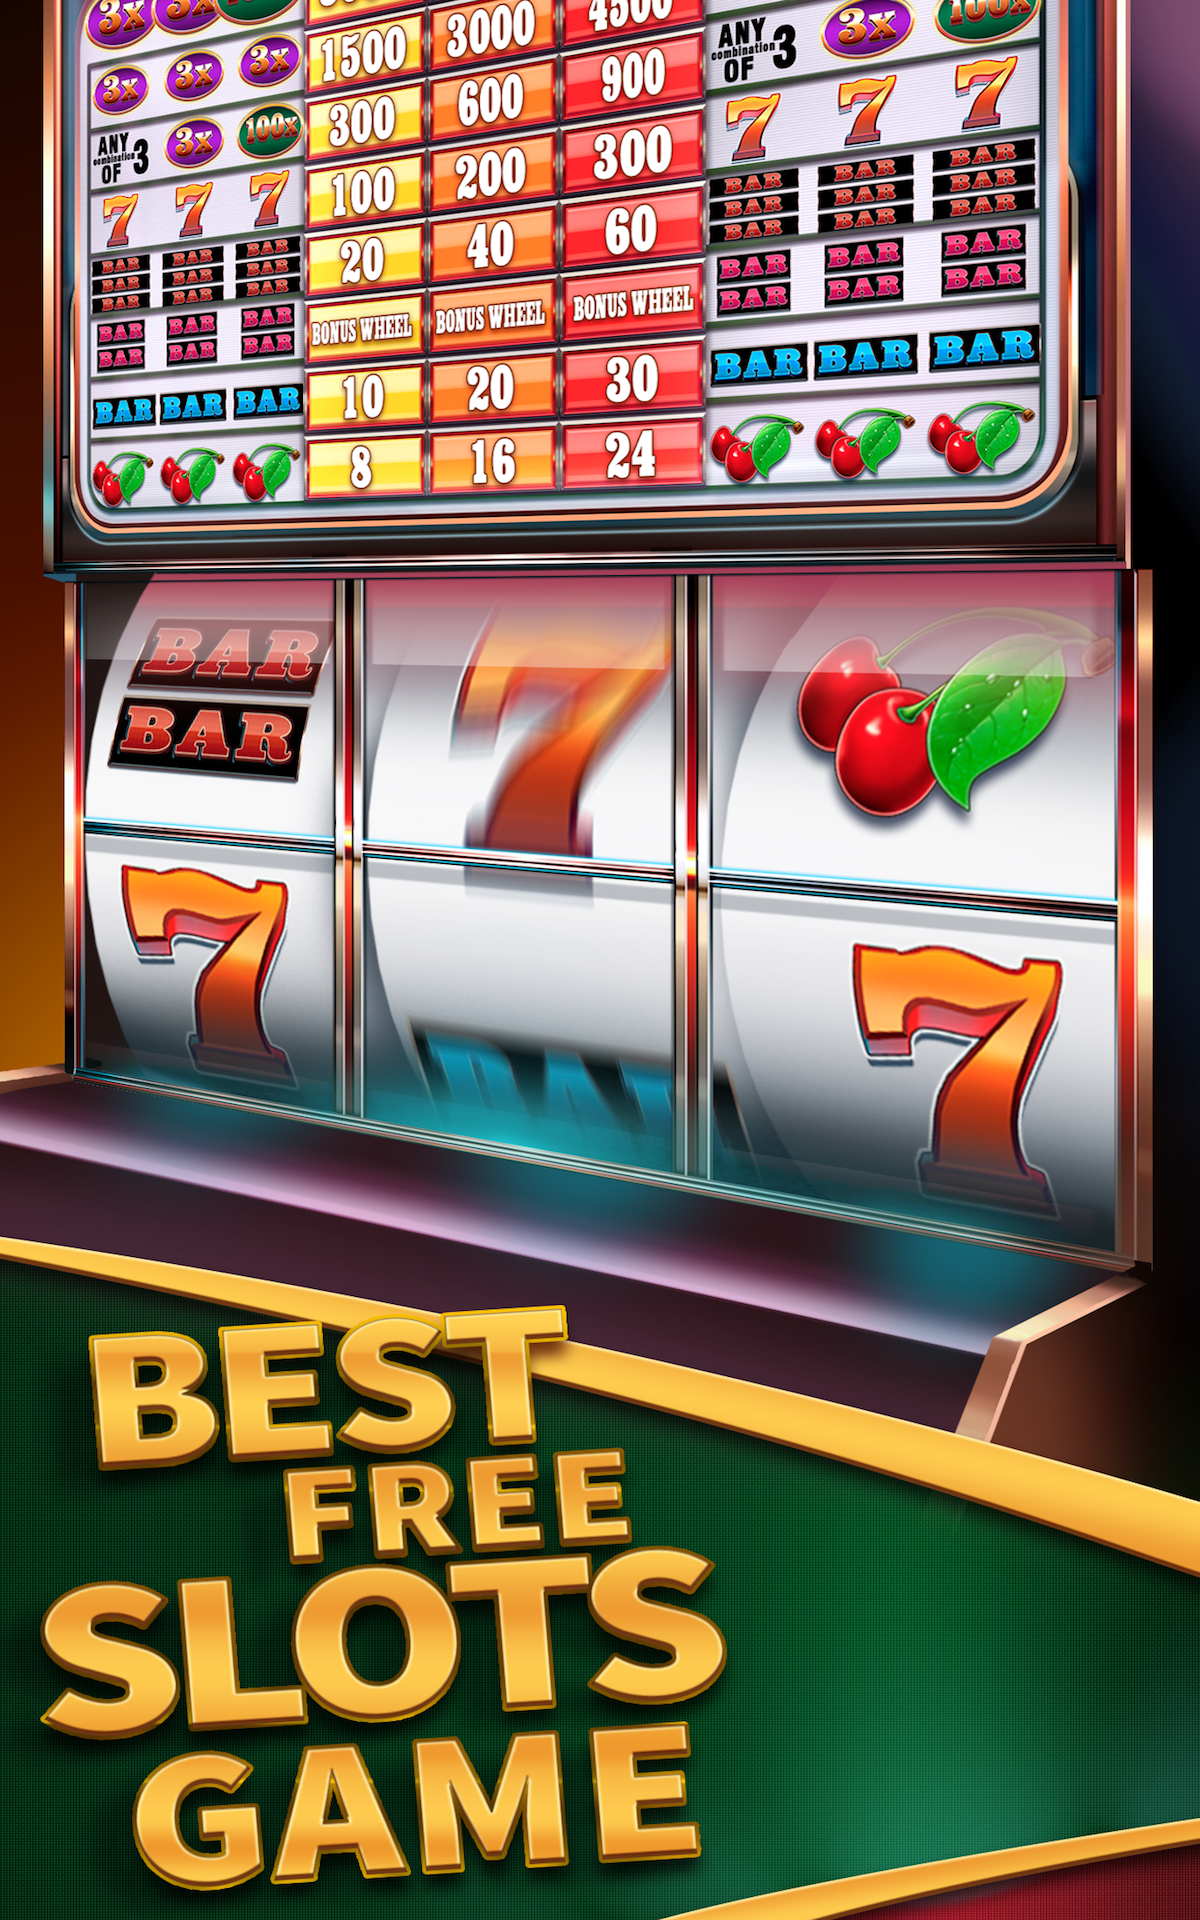 Slots Games Lasbeggas Free